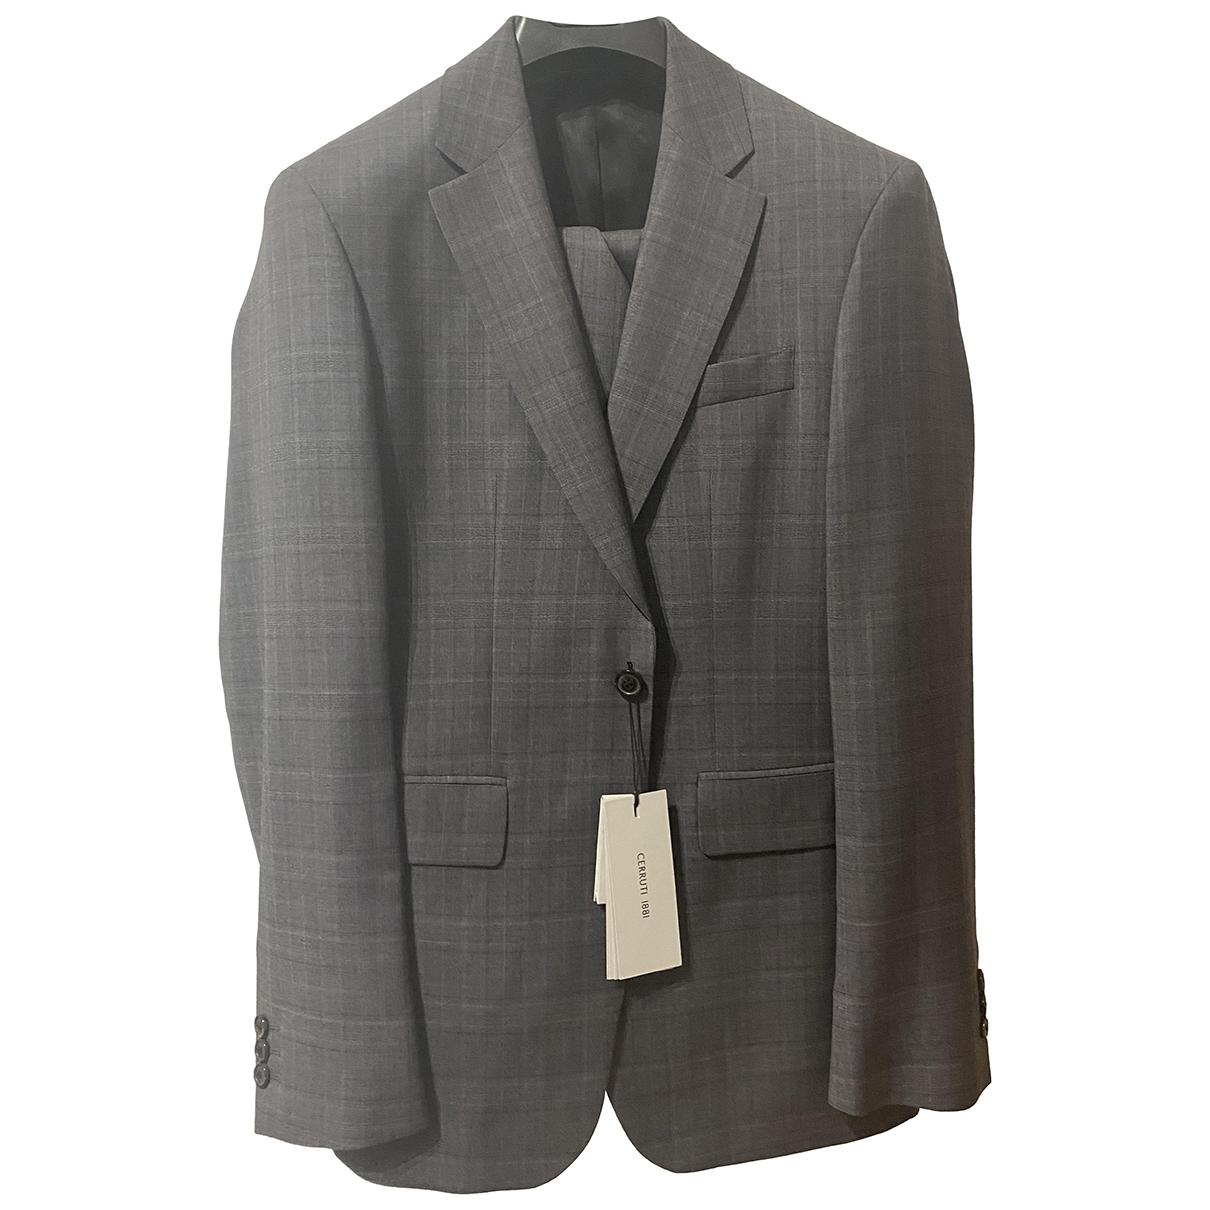 Cerruti \N Anthracite Wool Suits for Men 48 IT